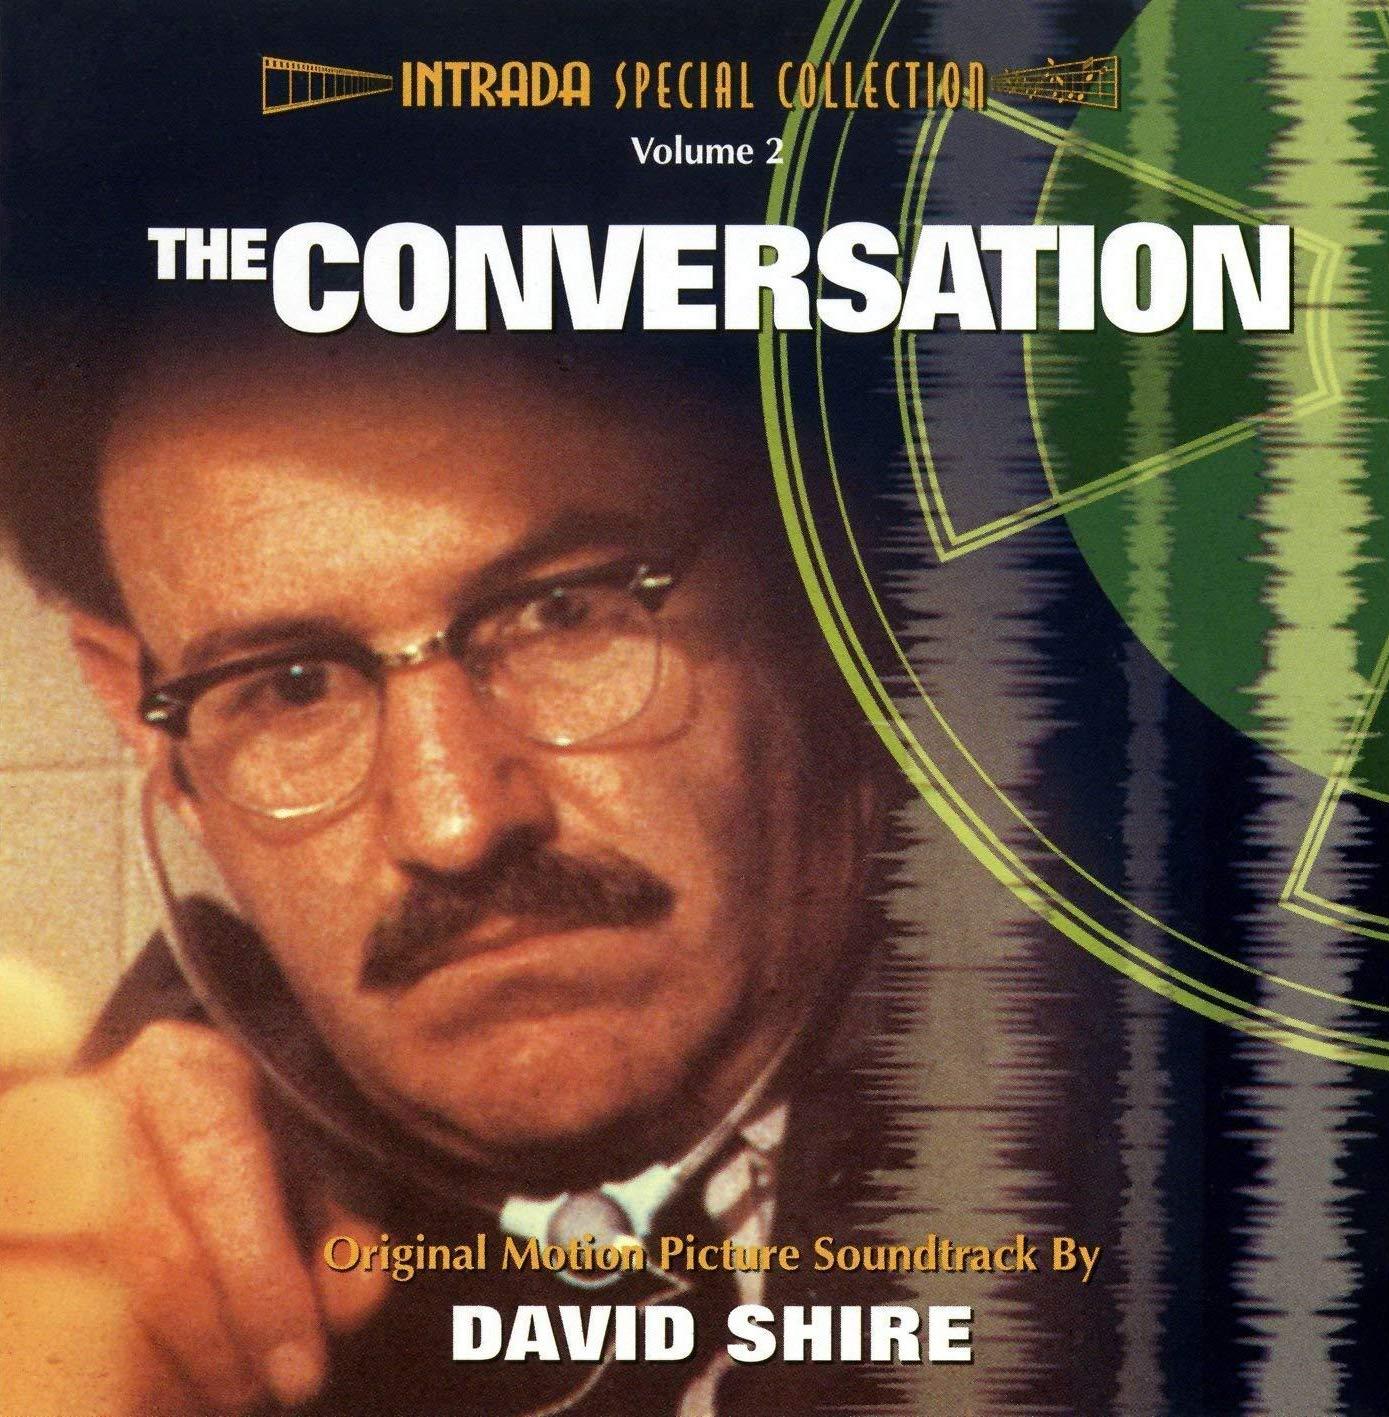 David Shire - Conversation / Soundtrack